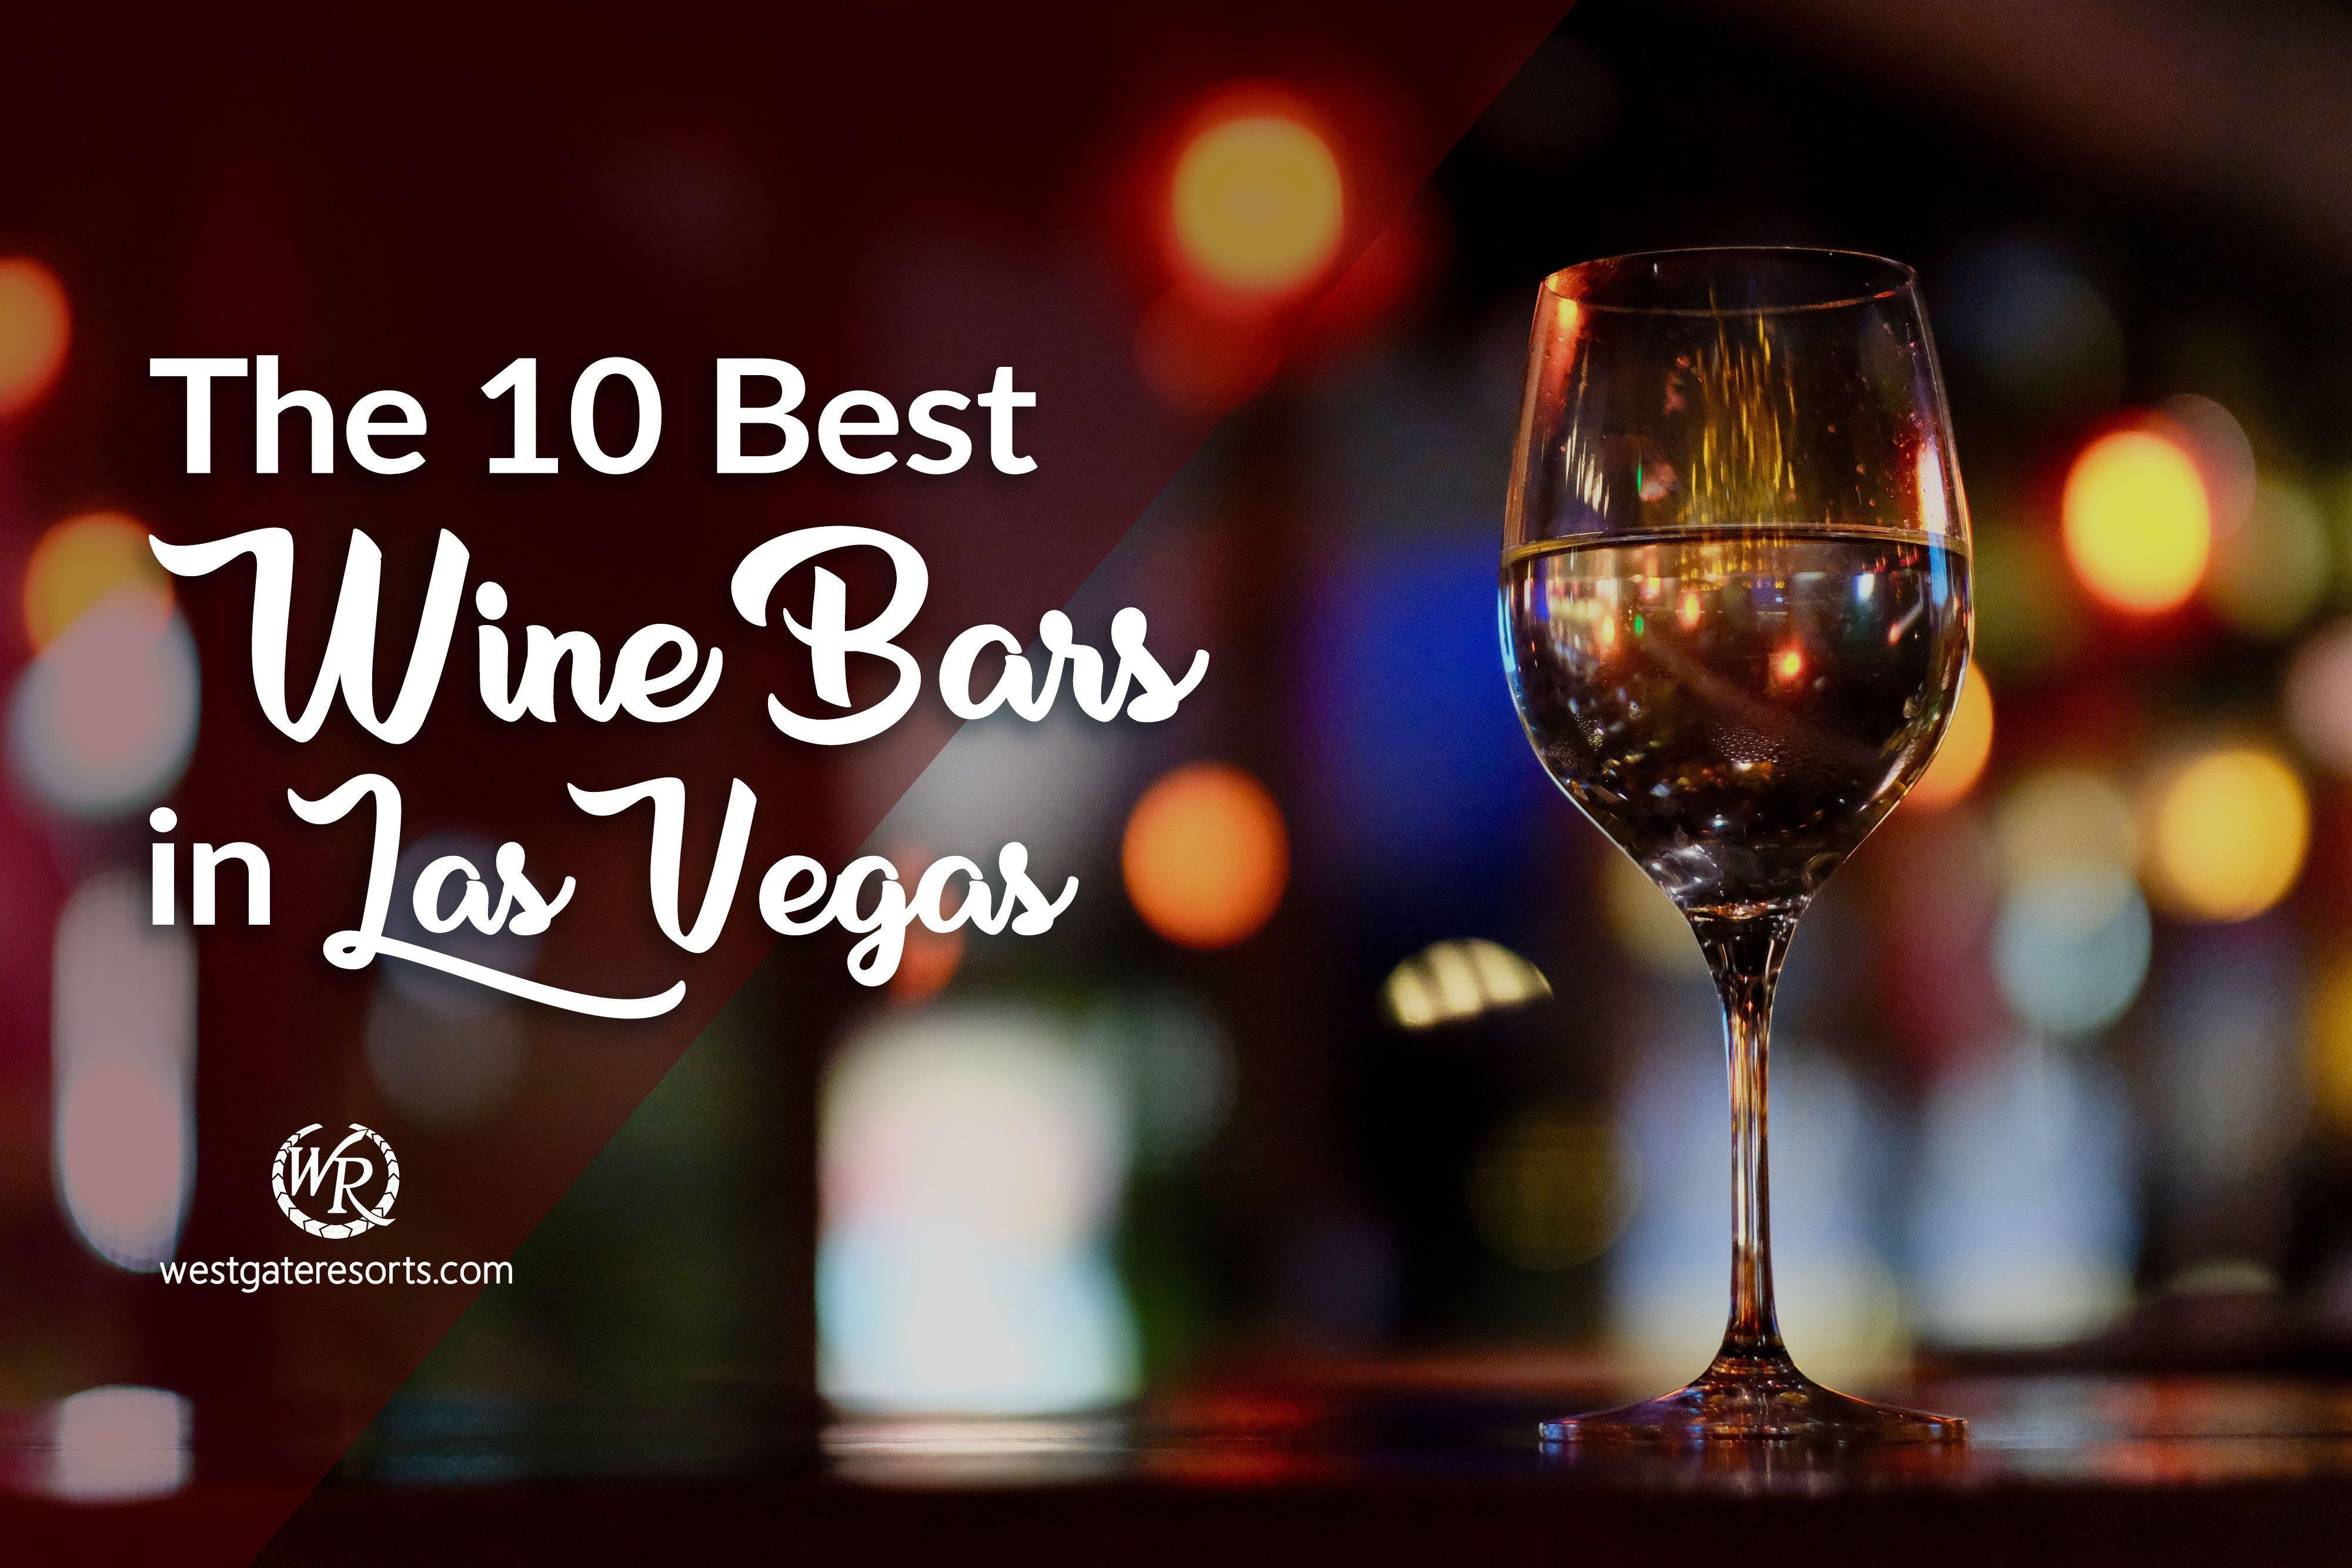 The 10 Best Wine Bars in Las Vegas